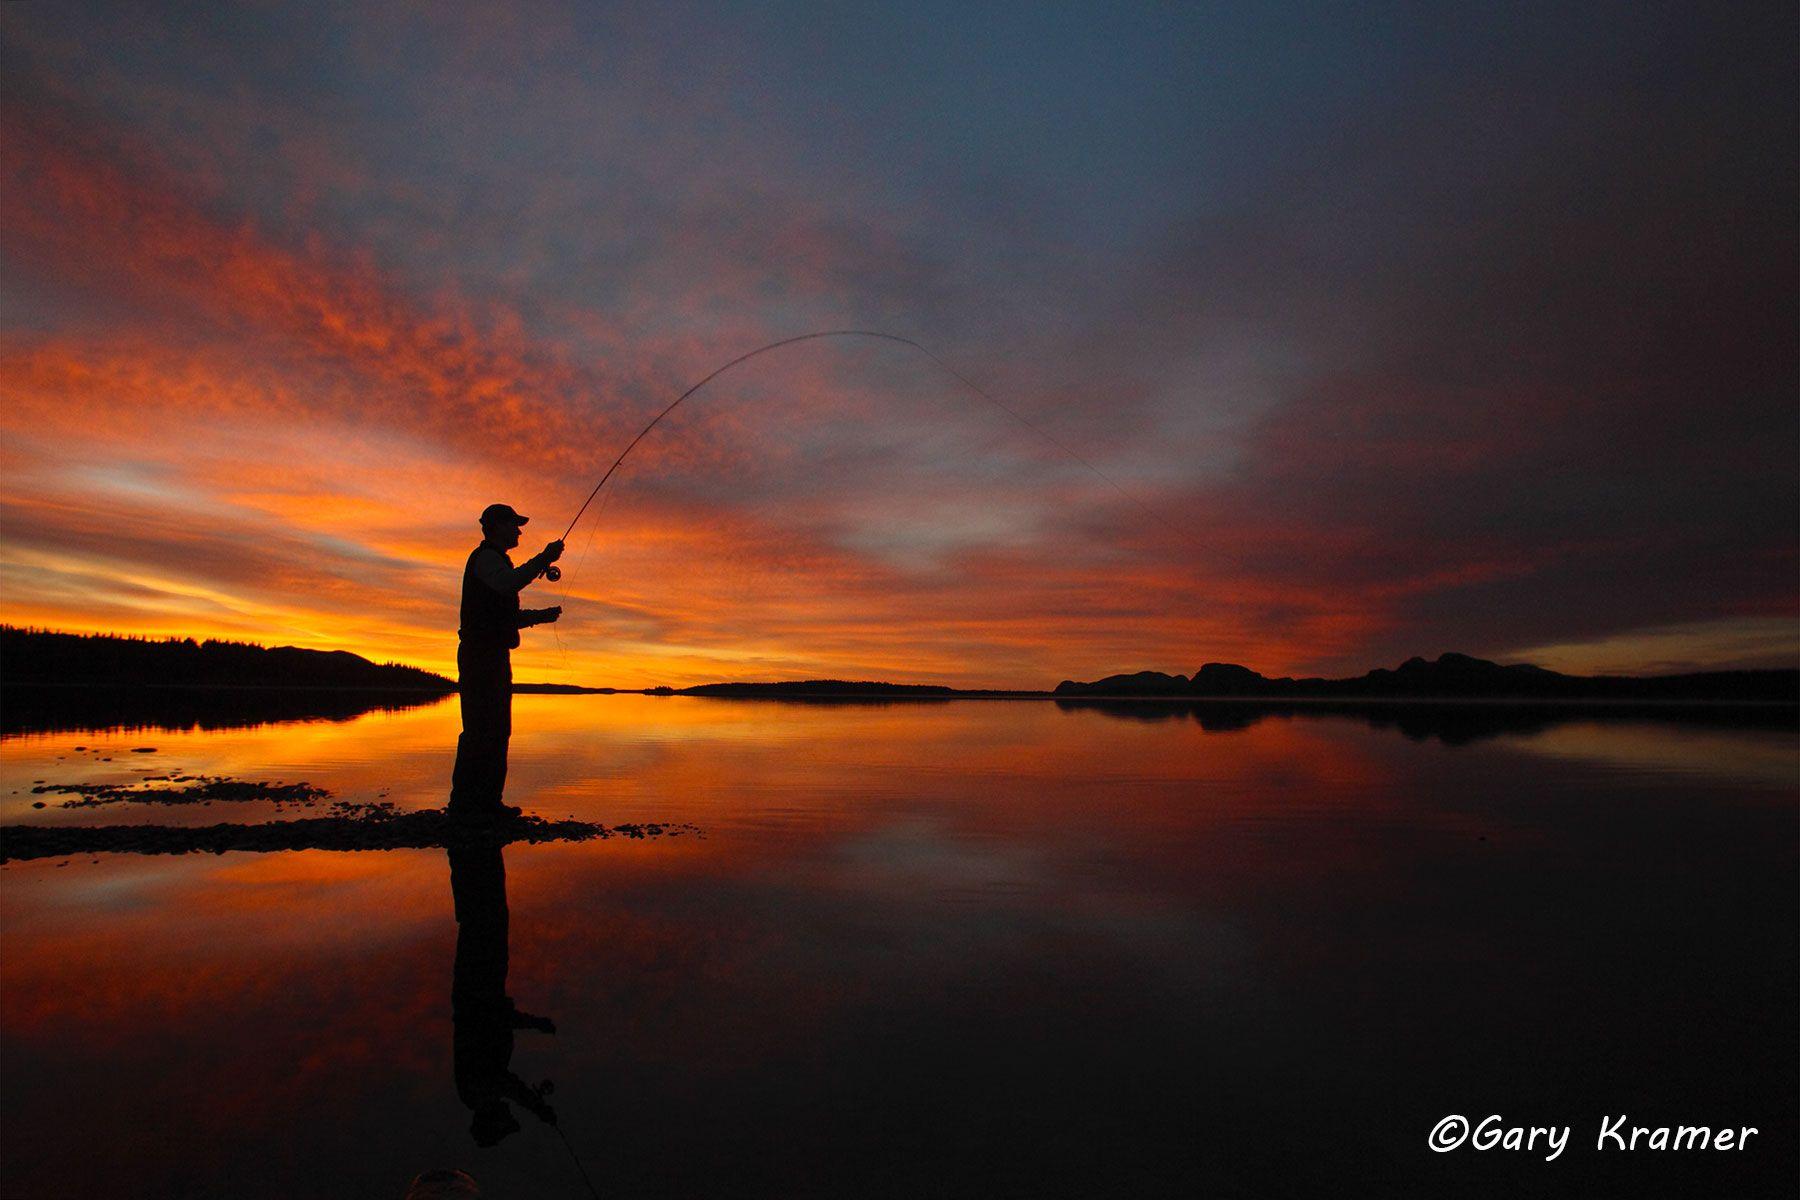 Fly Fisherman at Sunrise/Sunset - GFFs#009d